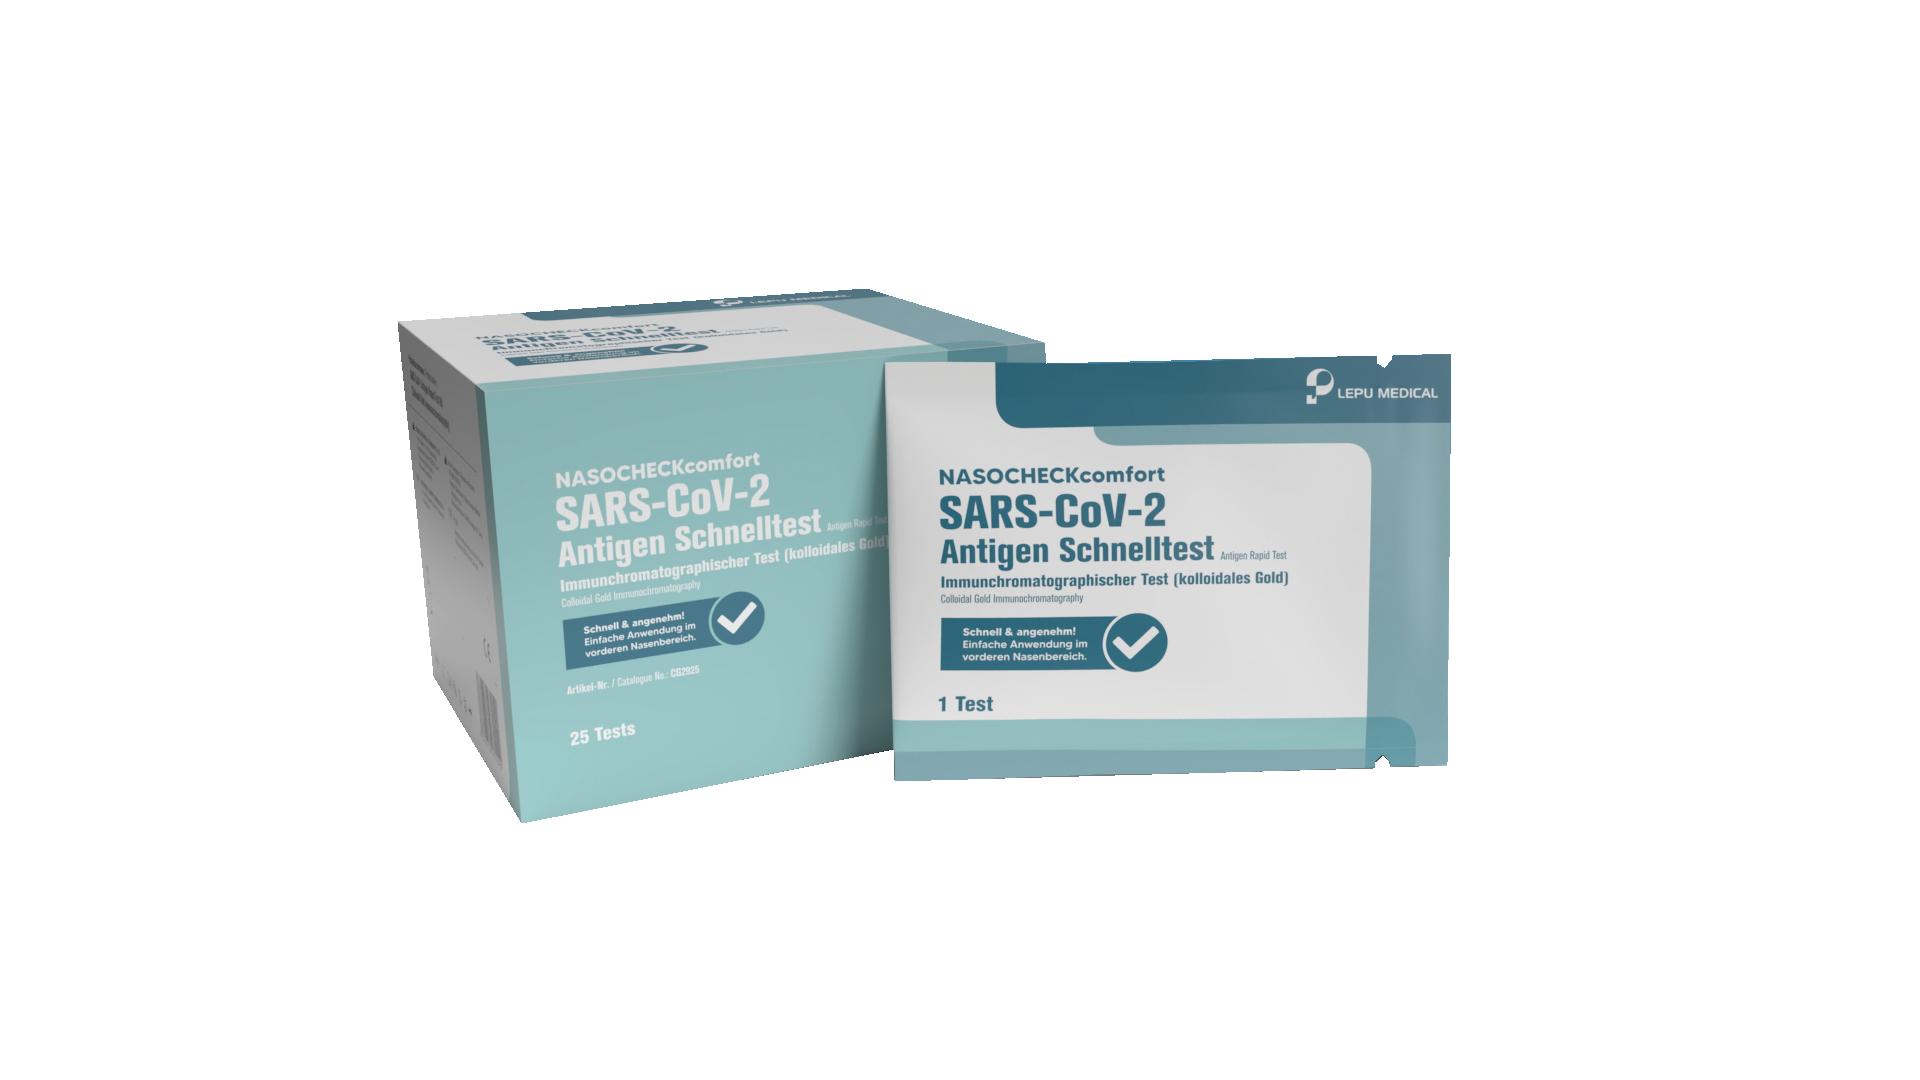 COVID - 19 AntiGen Schnelltest für Laien 25er Pack | LEPU Medical SARS-CoV-2